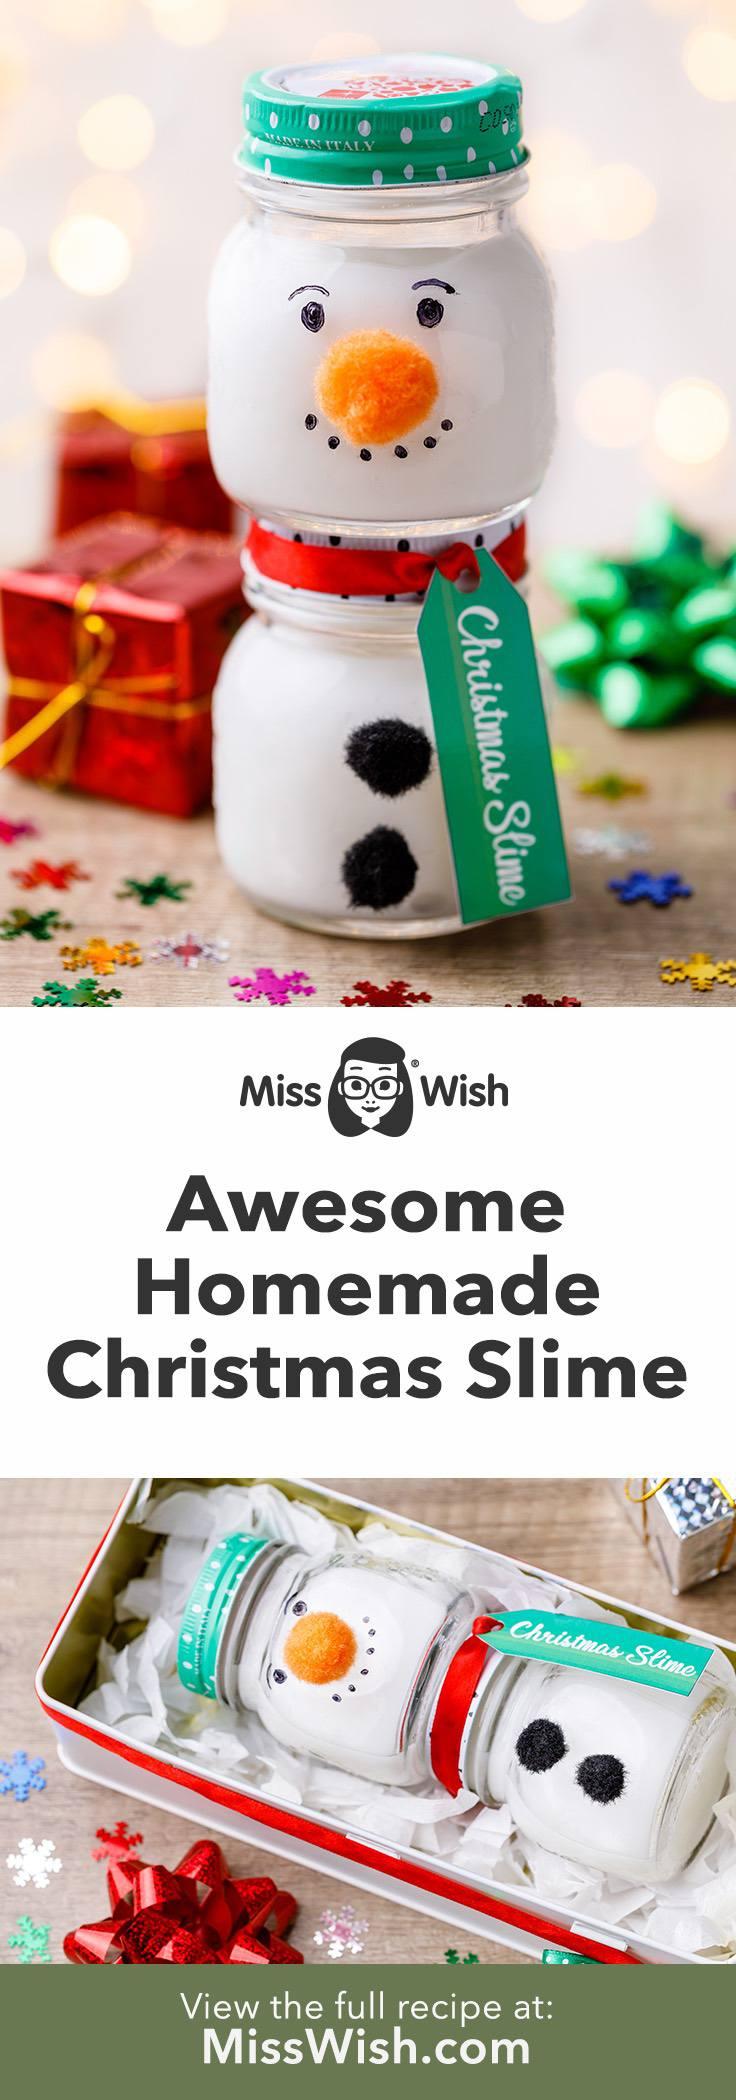 Awesome Homemade Christmas Slime Made with Glue